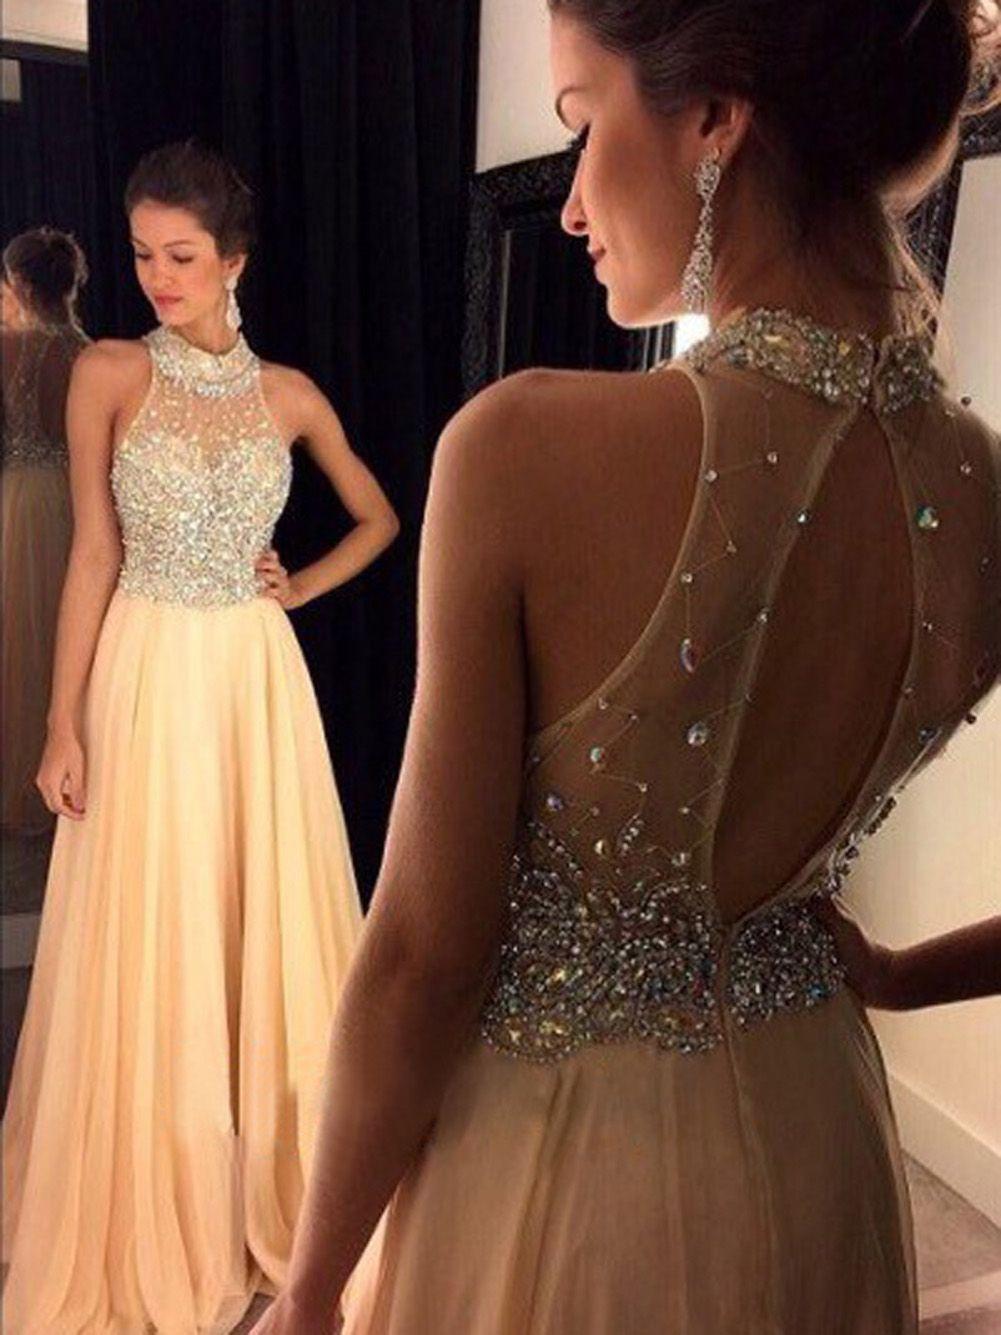 Pin by alisa william on prom dresses pinterest prom school